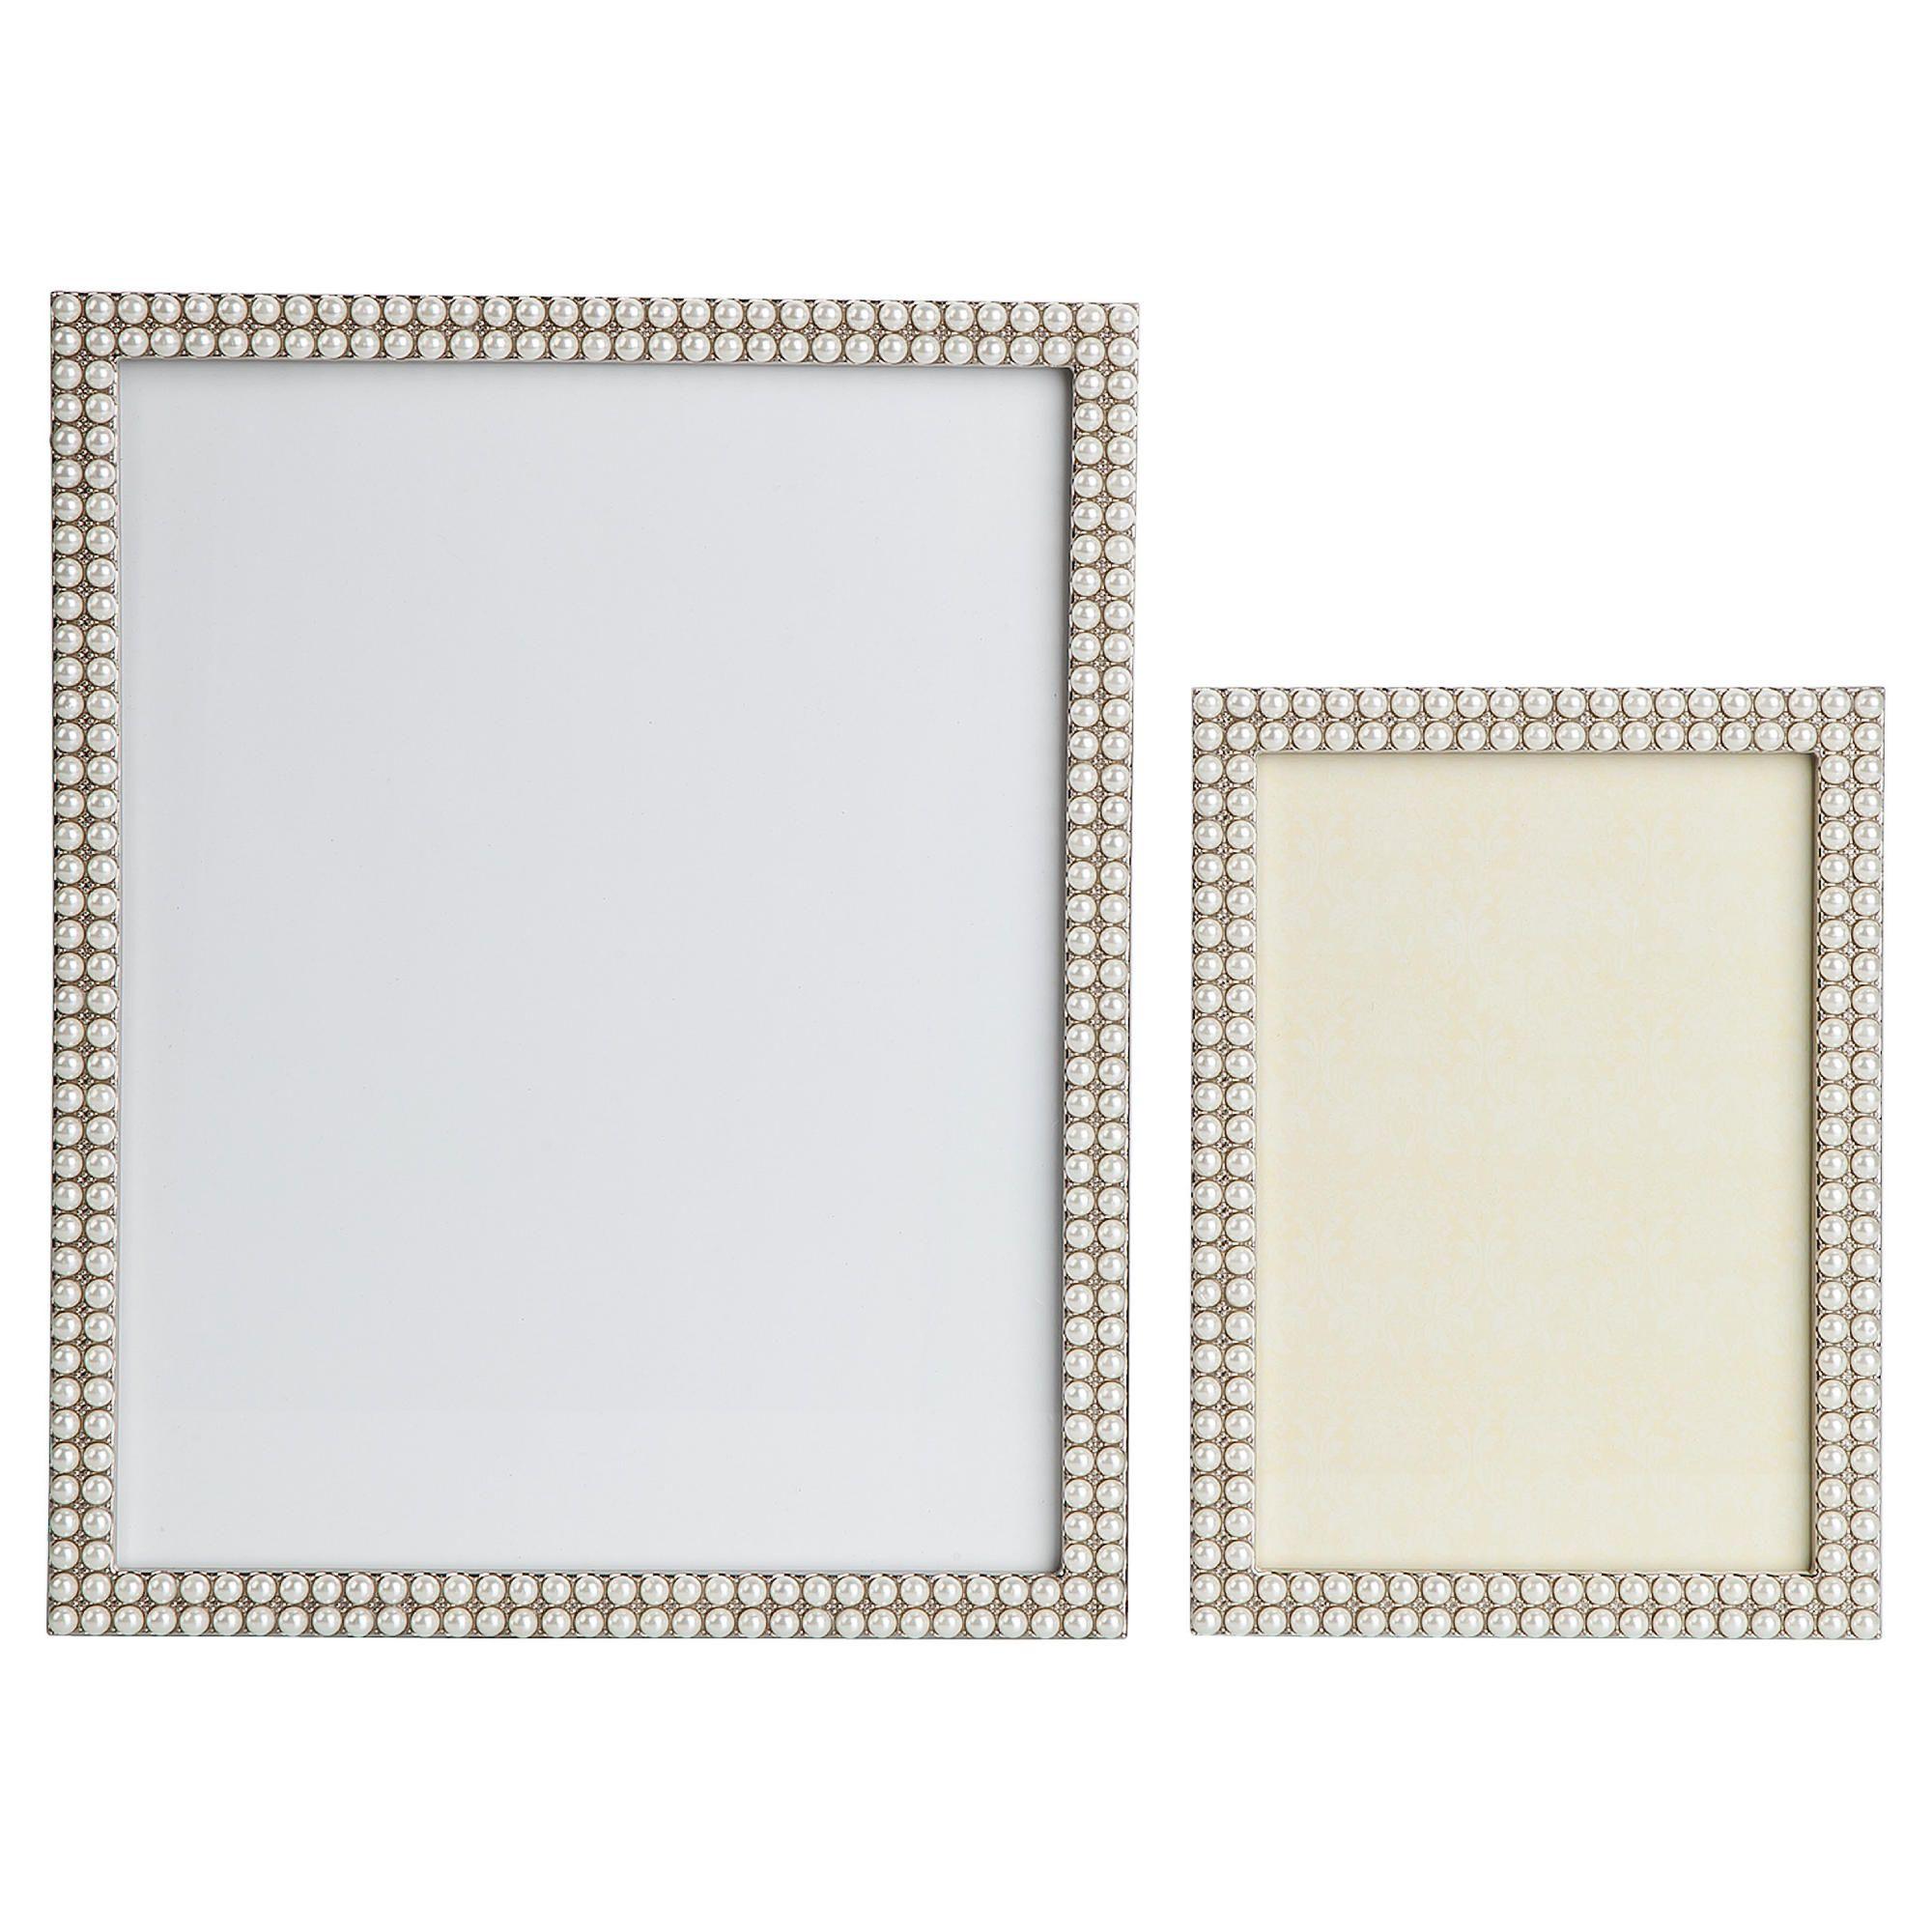 set-2-pearl-frames-8x10-5x7